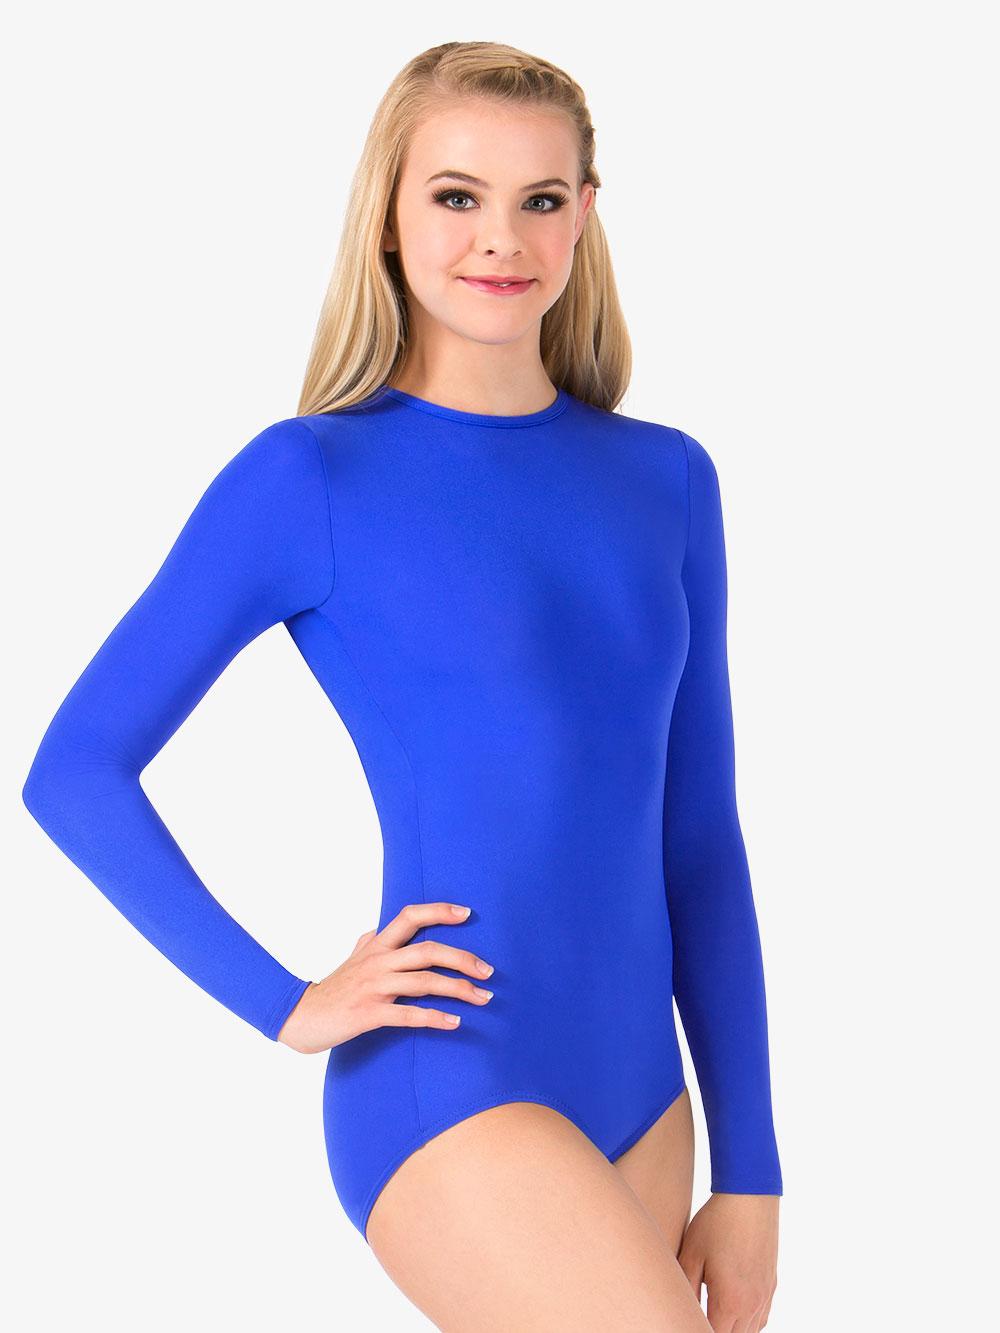 Hollywood Star Fashion Womens Short-Sleeve Scoop Neck Snap Crotch Leotard Snap Crotch Bodysuit